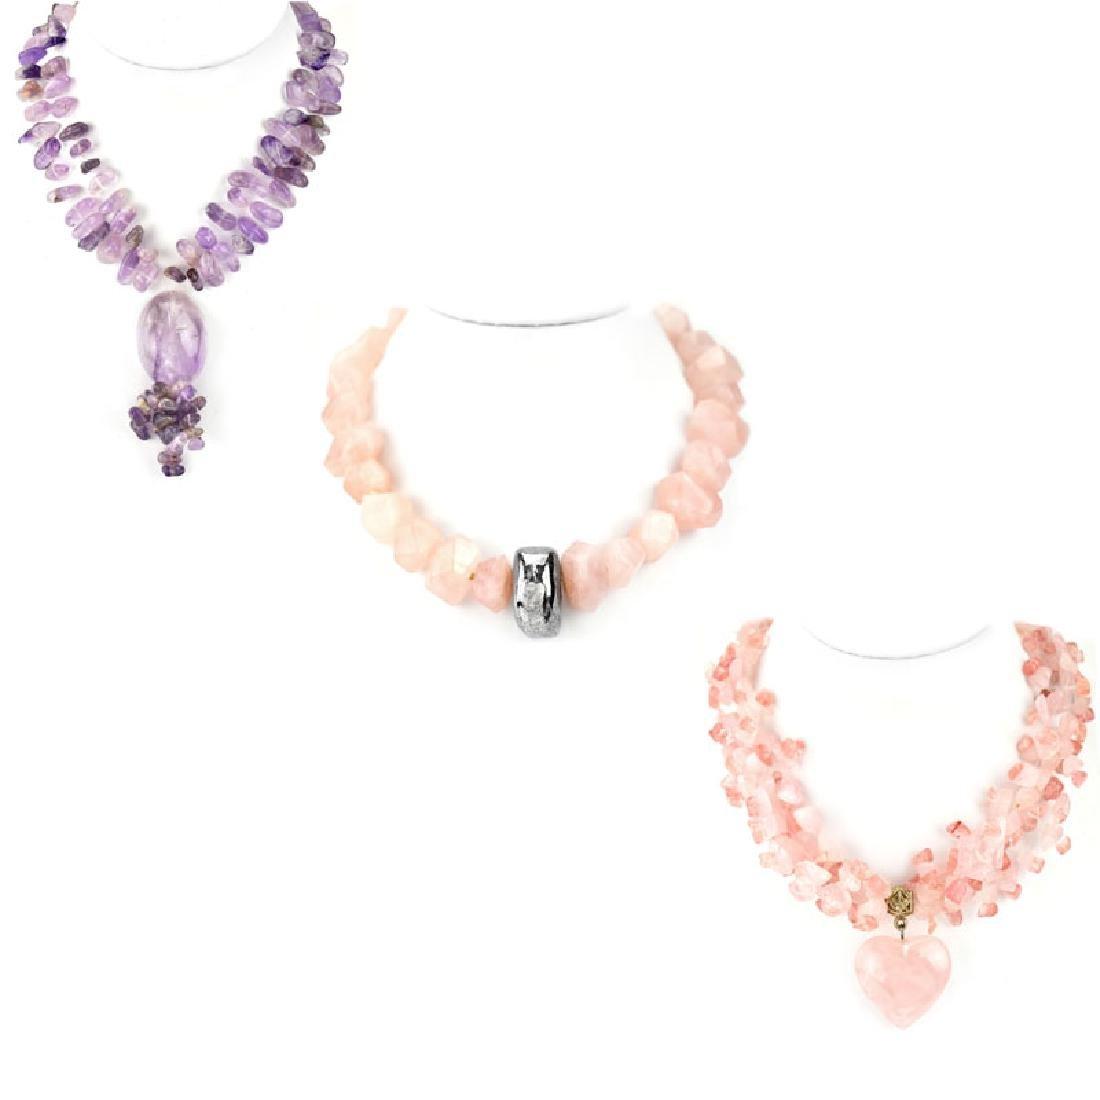 Three (3) Vintage Quartz Beaded Necklaces